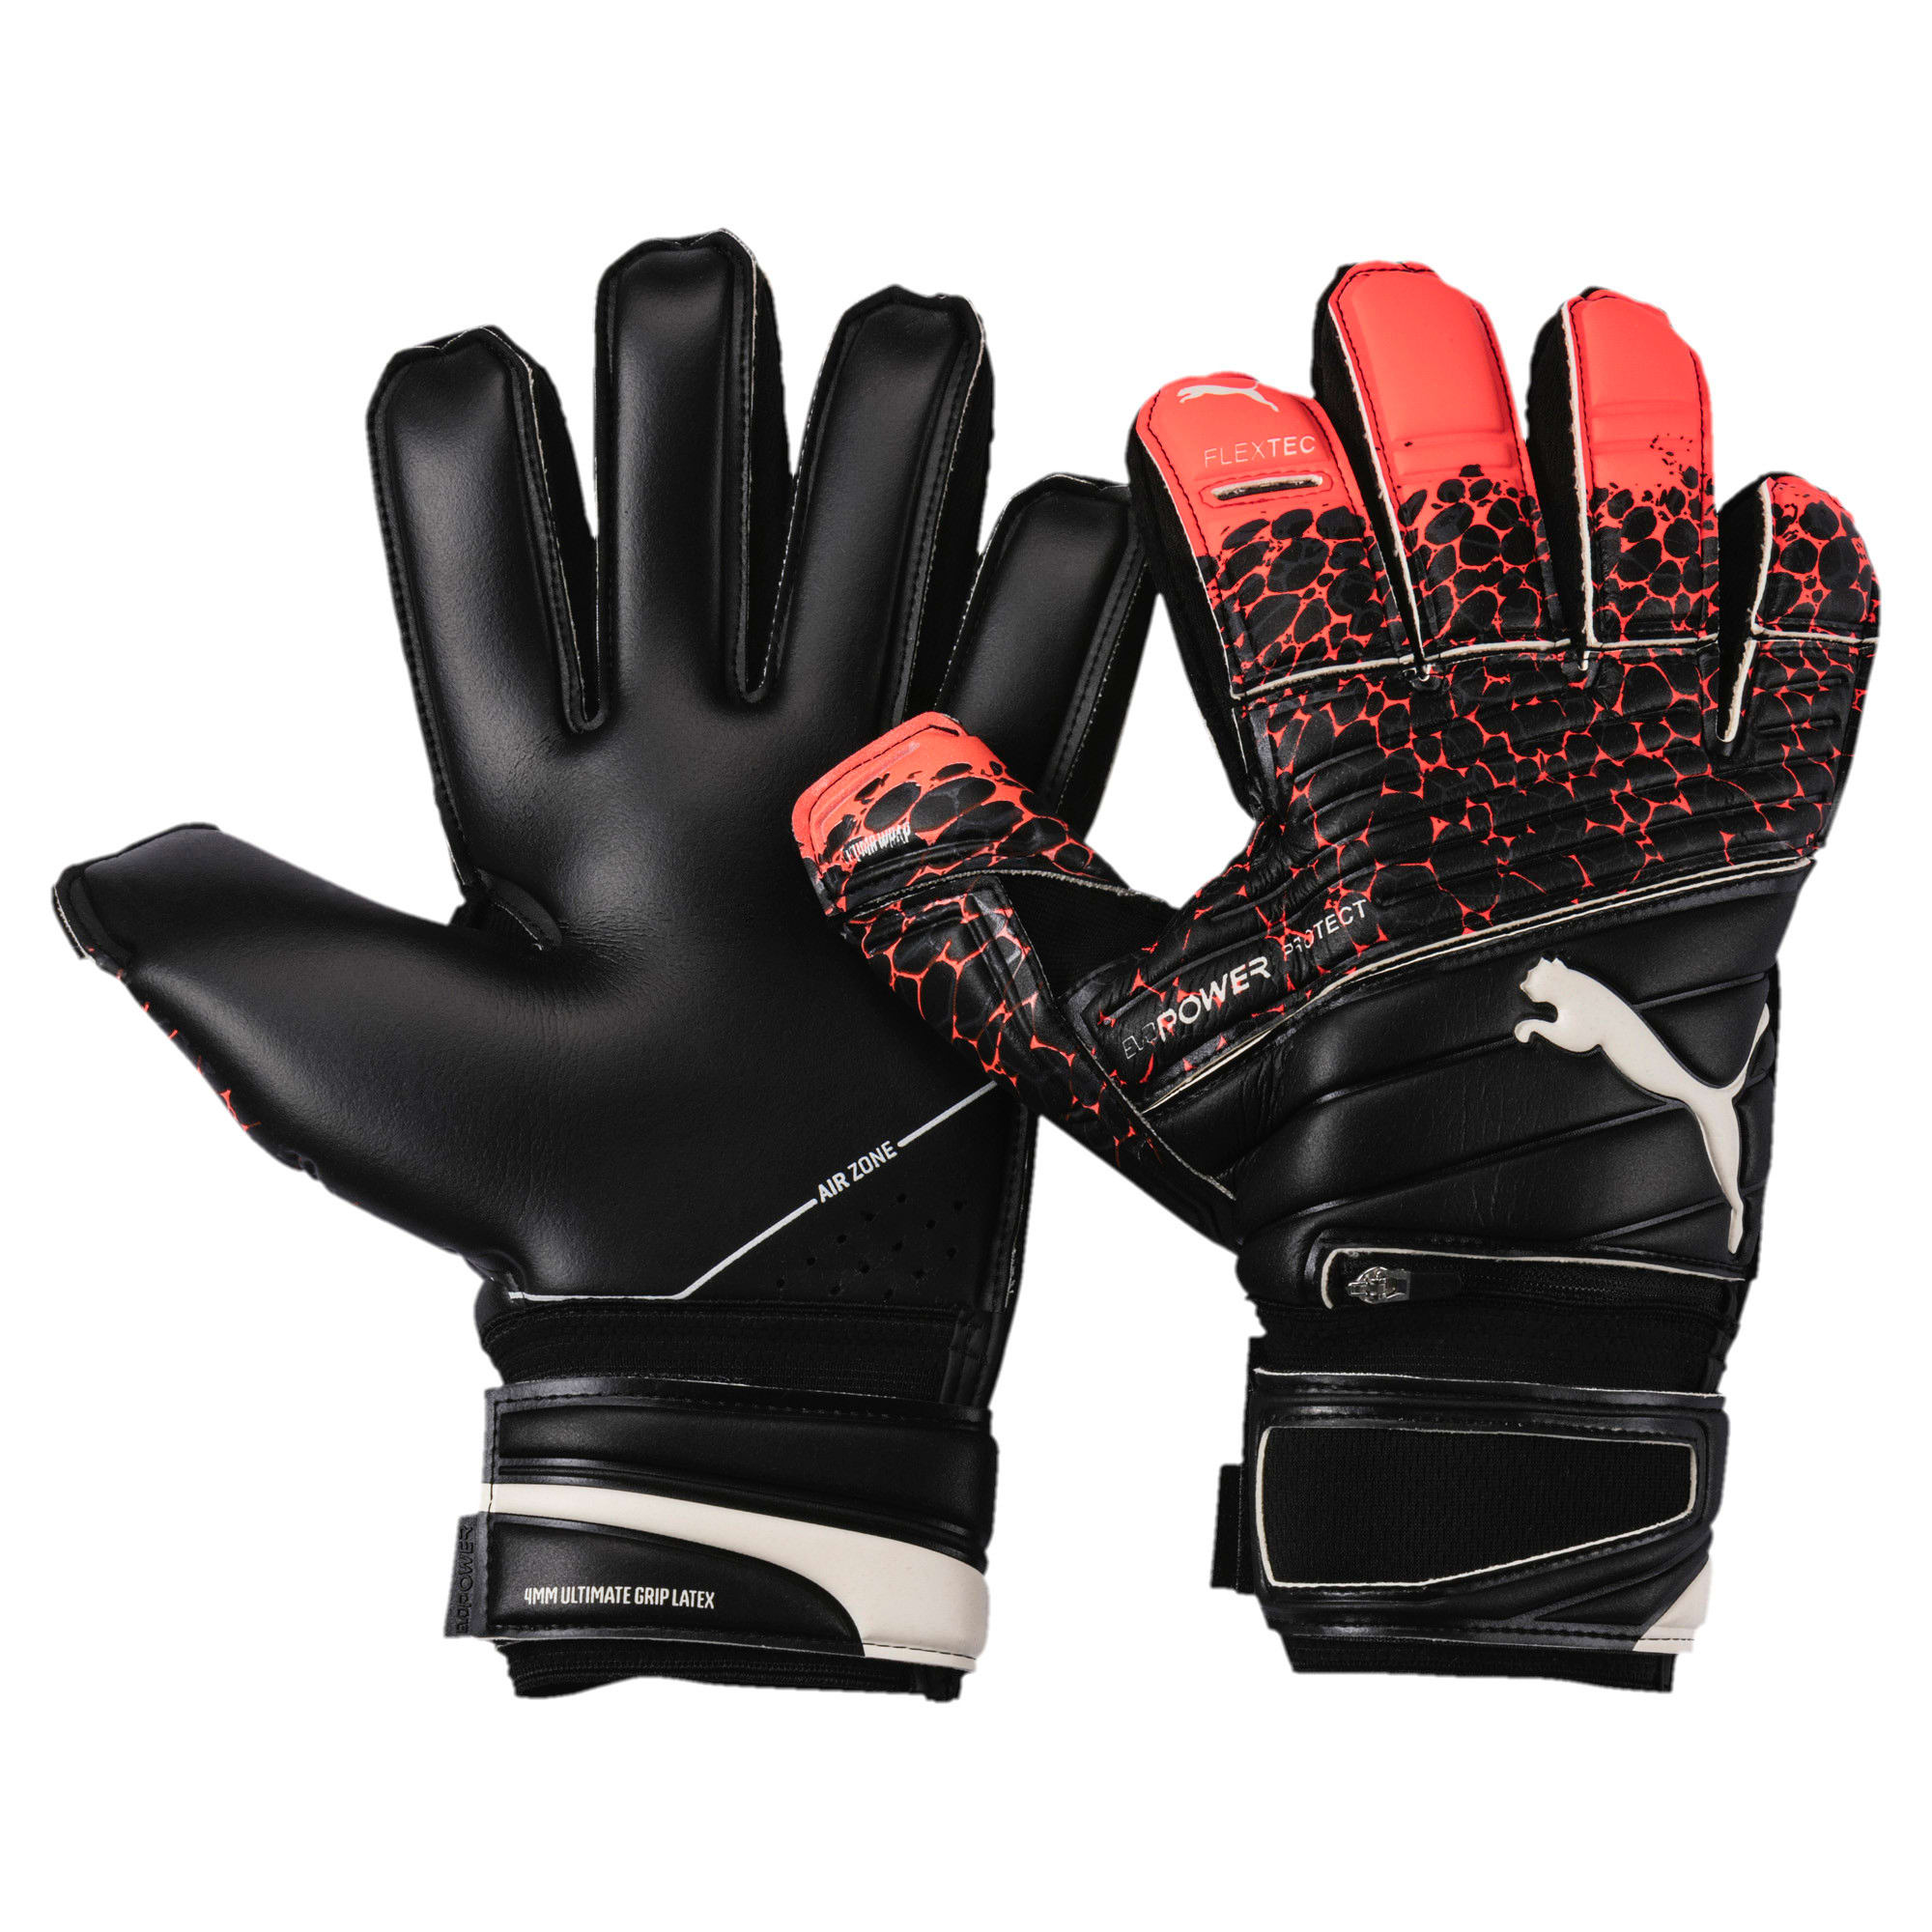 Thumbnail 1 of evoPOWER Protect 1.3 Soccer Goalkeeper Gloves, Fiery Coral-Black-White, medium